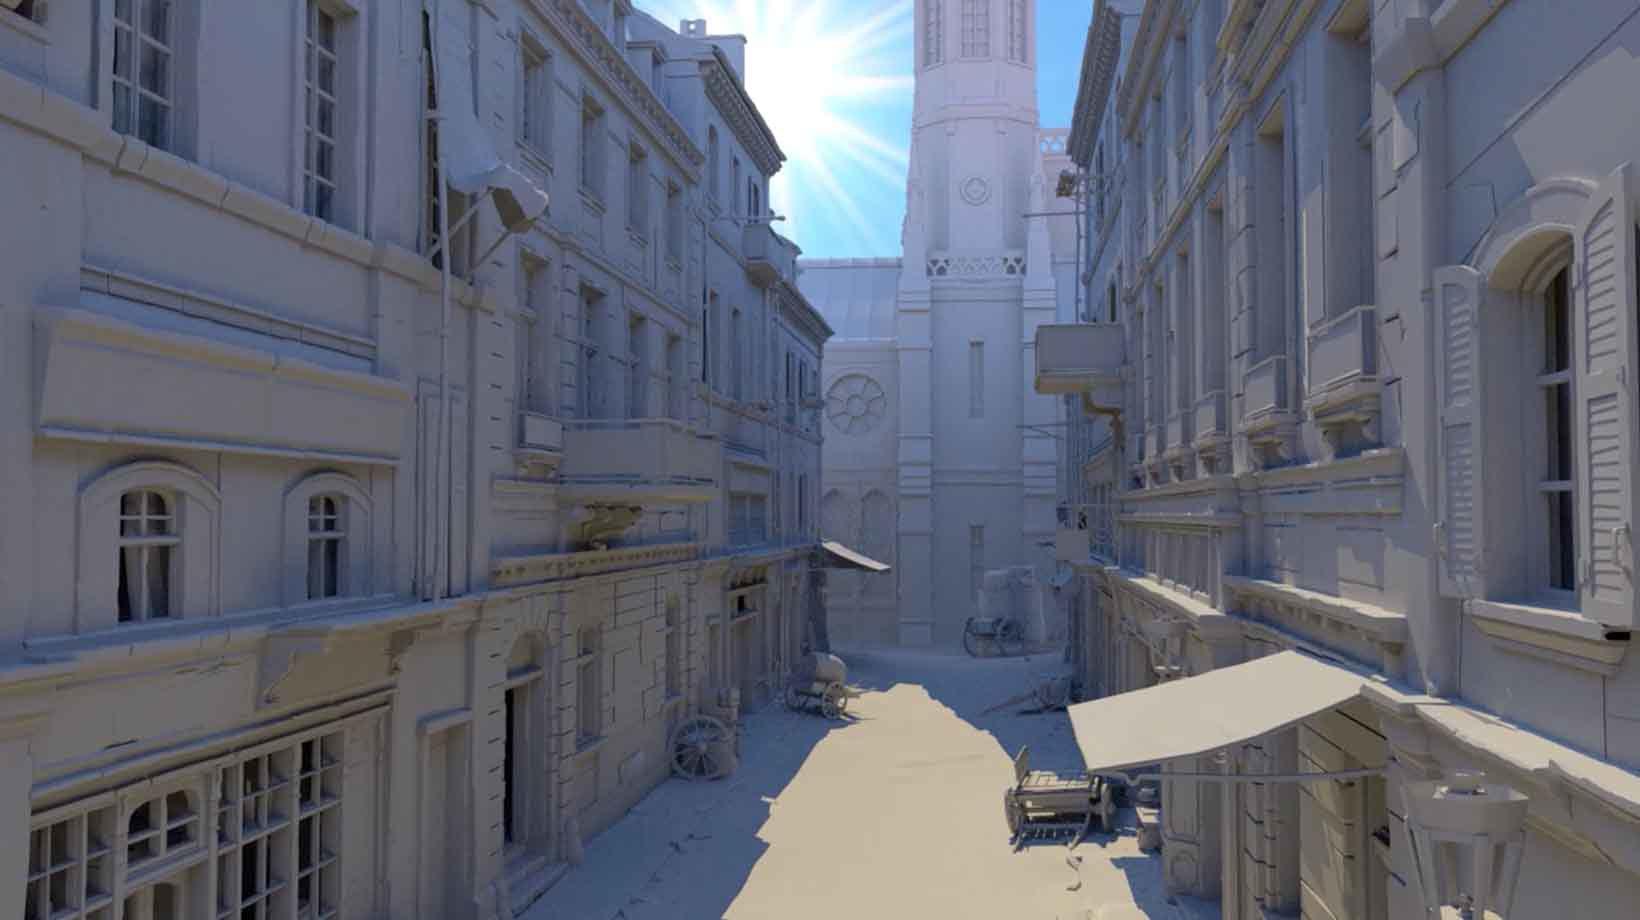 3D Cinema - year 4